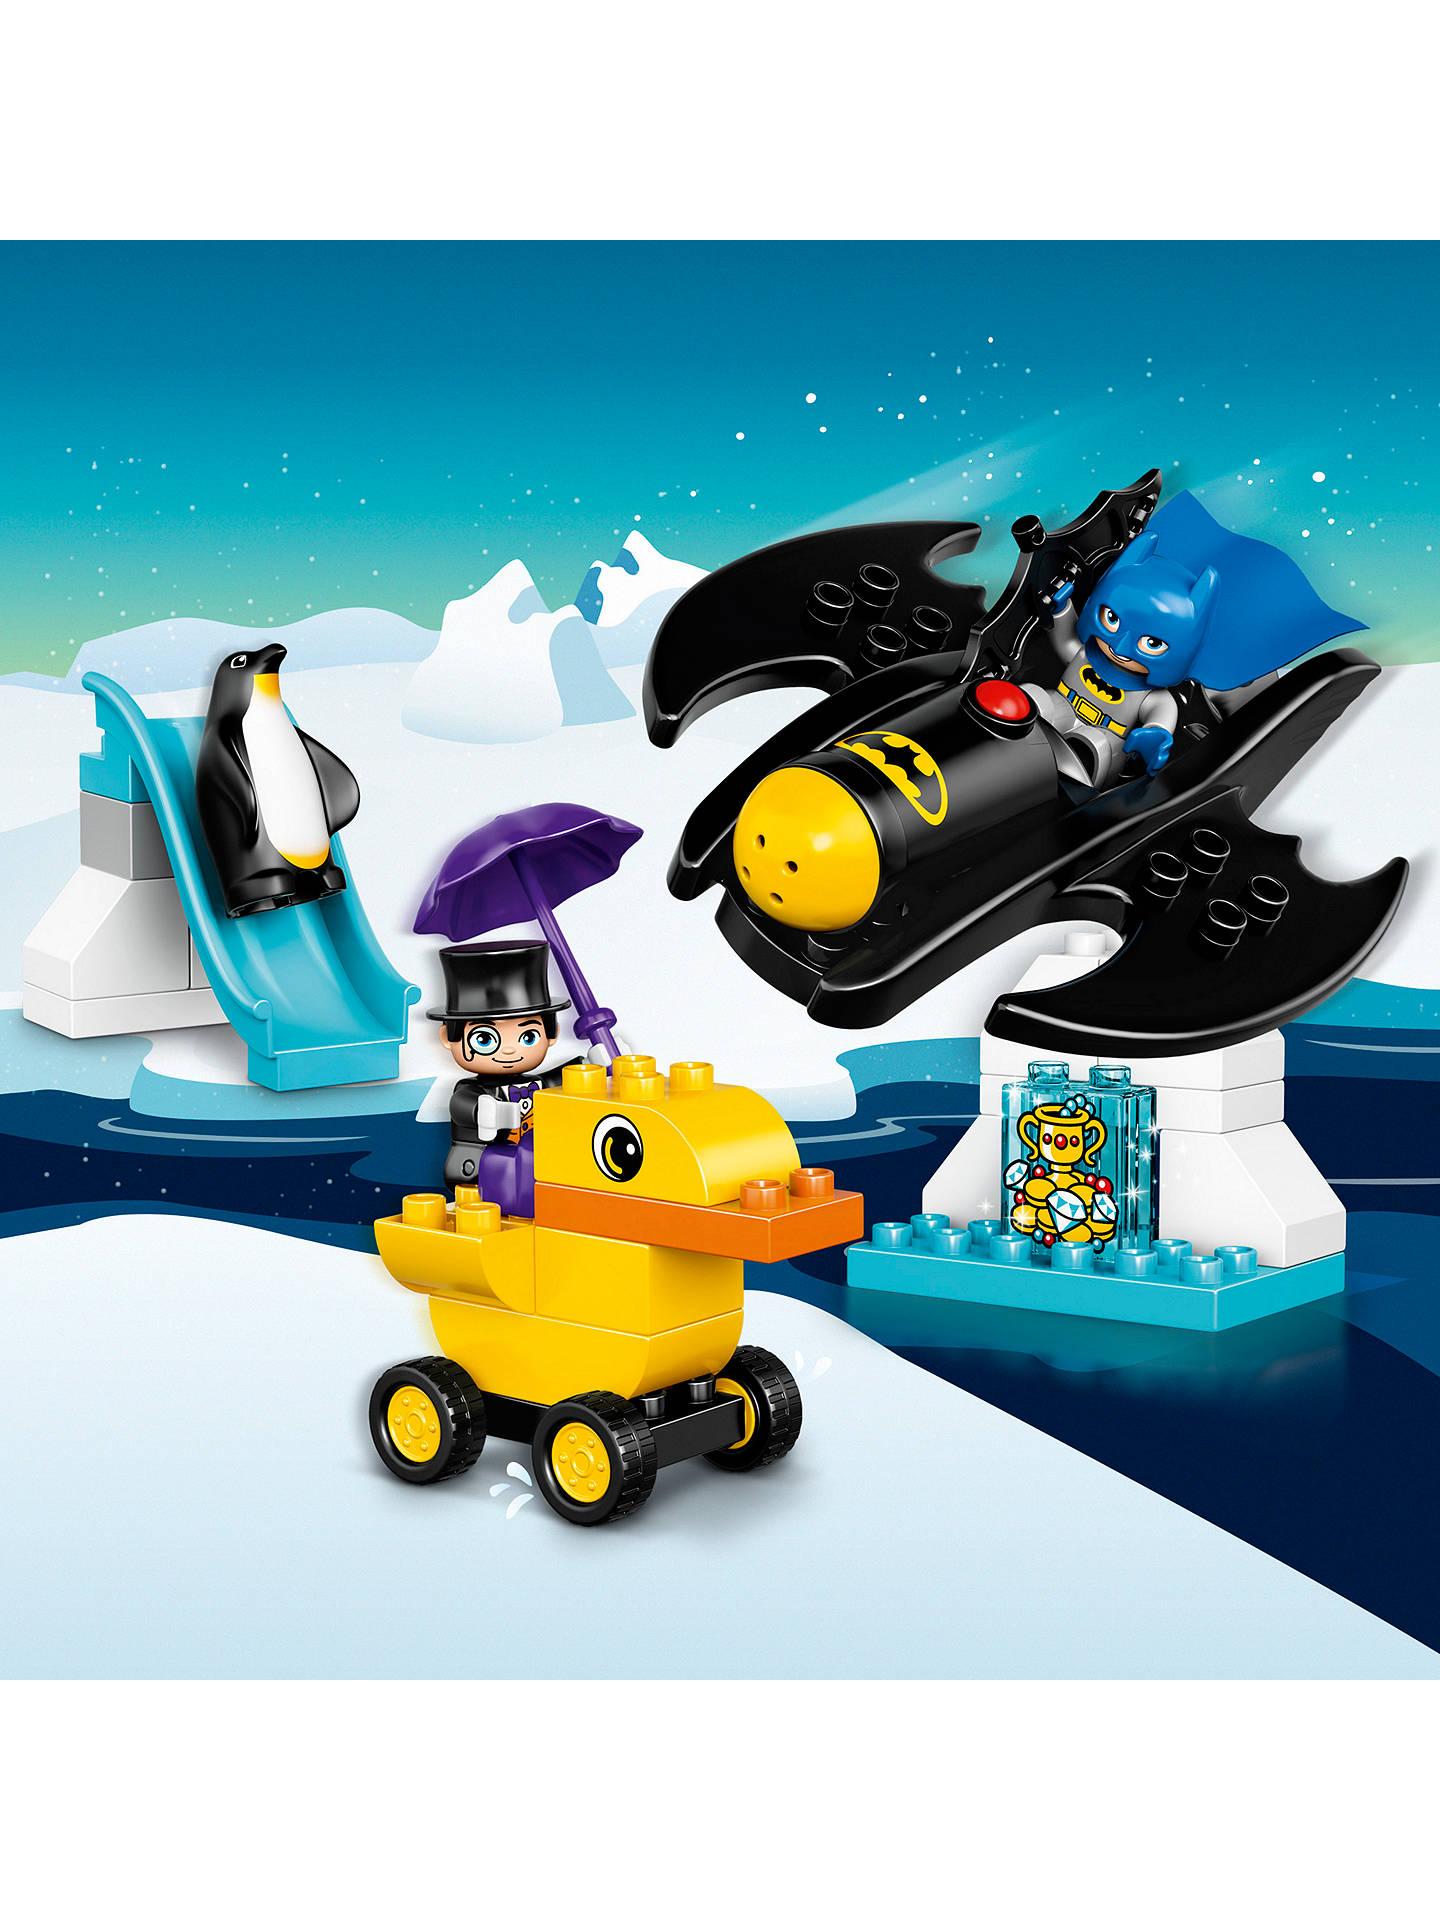 LEGO DUPLO 10823 Batwing Adventure at John Lewis & Partners